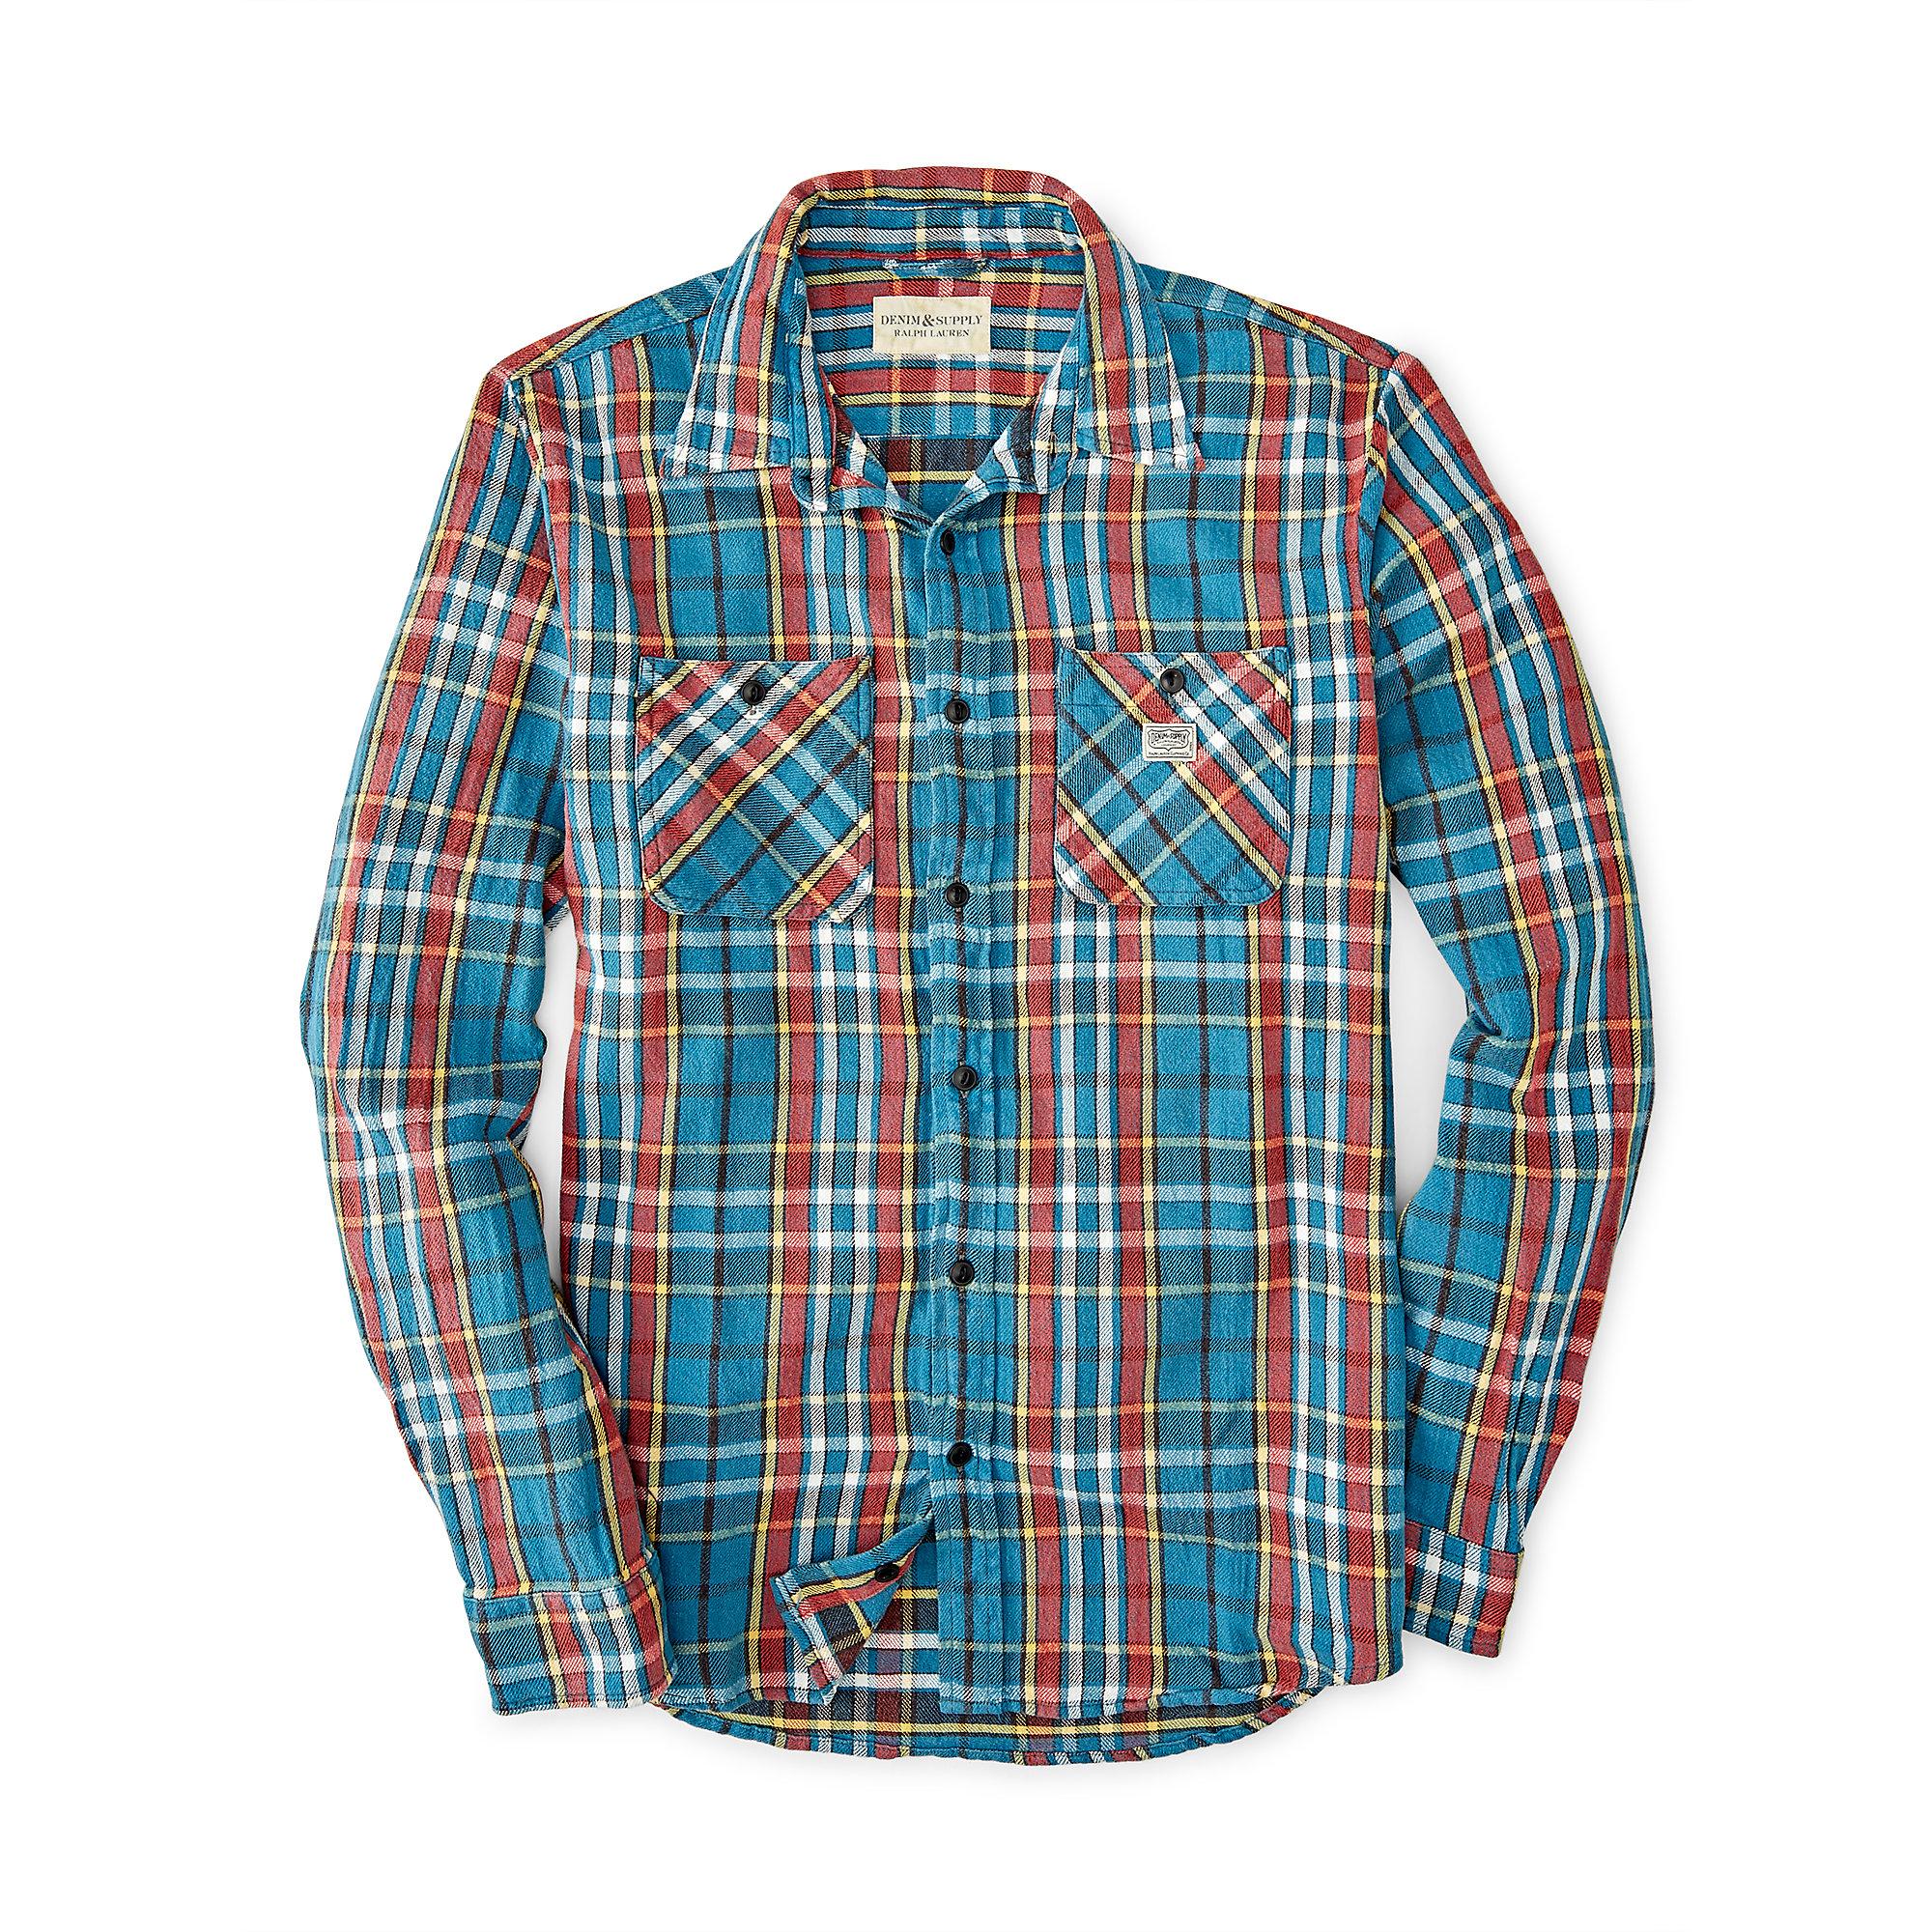 4f547a18c Denim   Supply Ralph Lauren Ward Plaid Cotton Twill Shirt in Blue ...